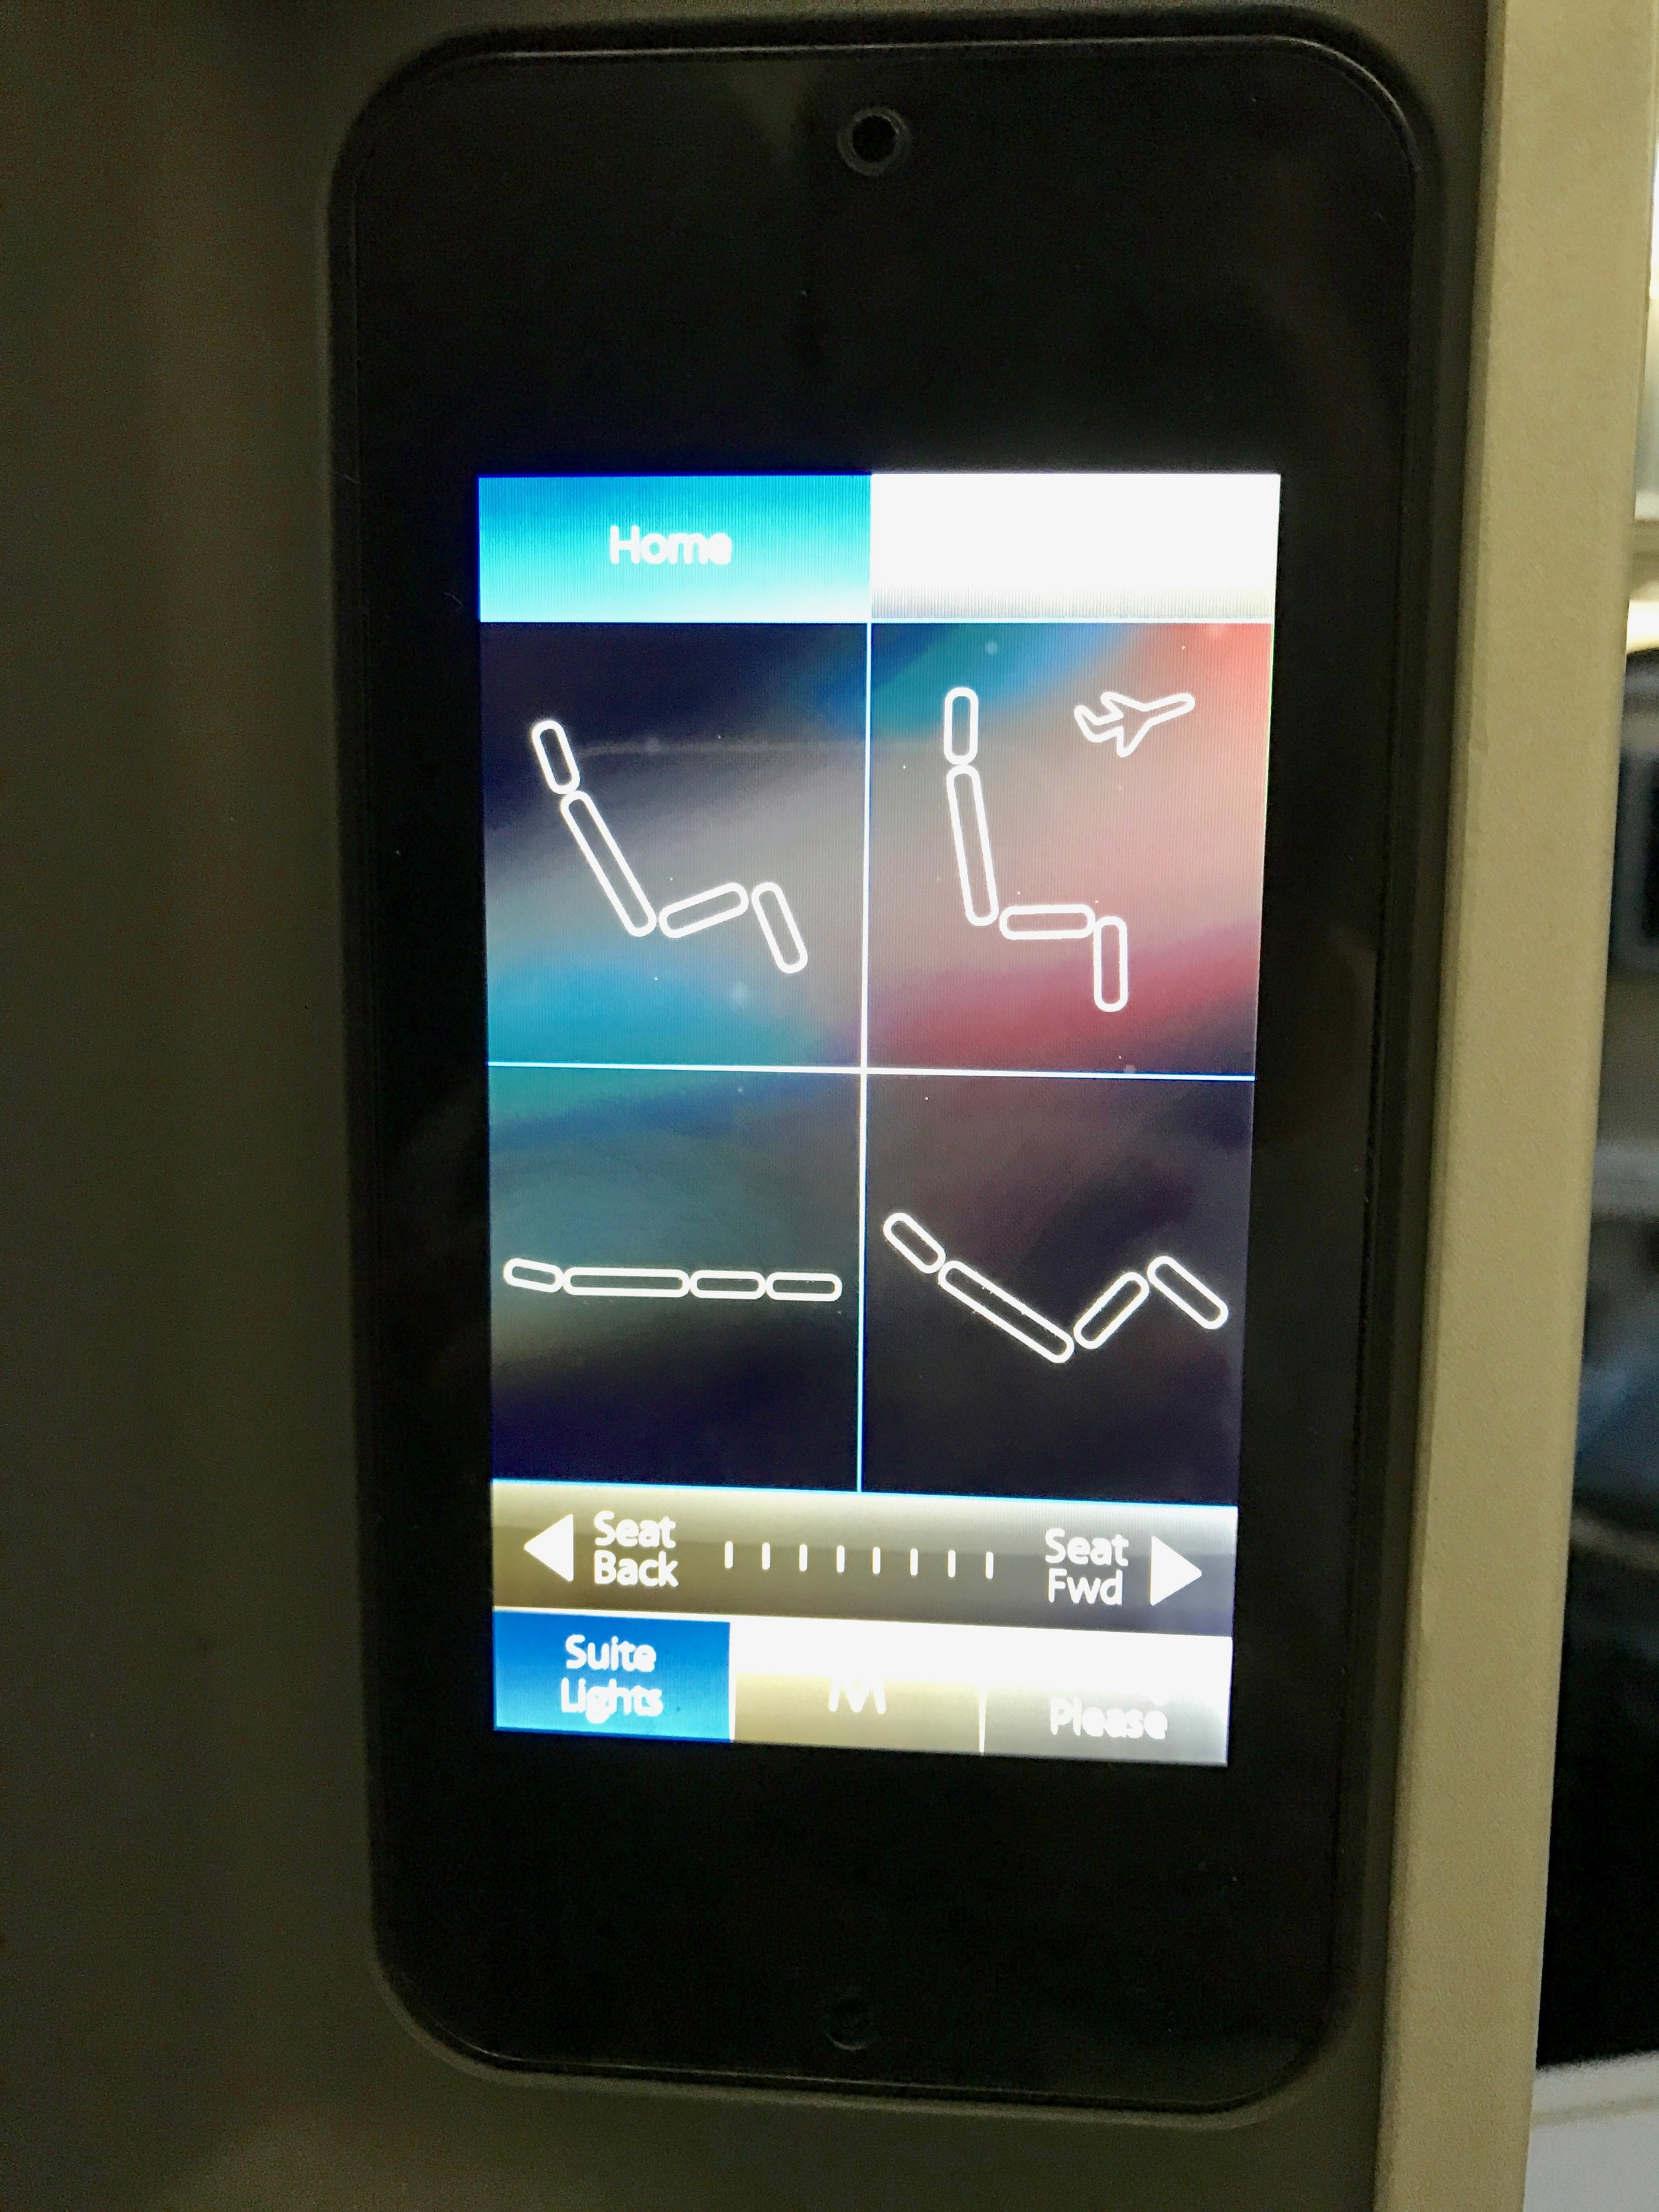 AA 787 Dreamliner Business Class seat control touchscreen